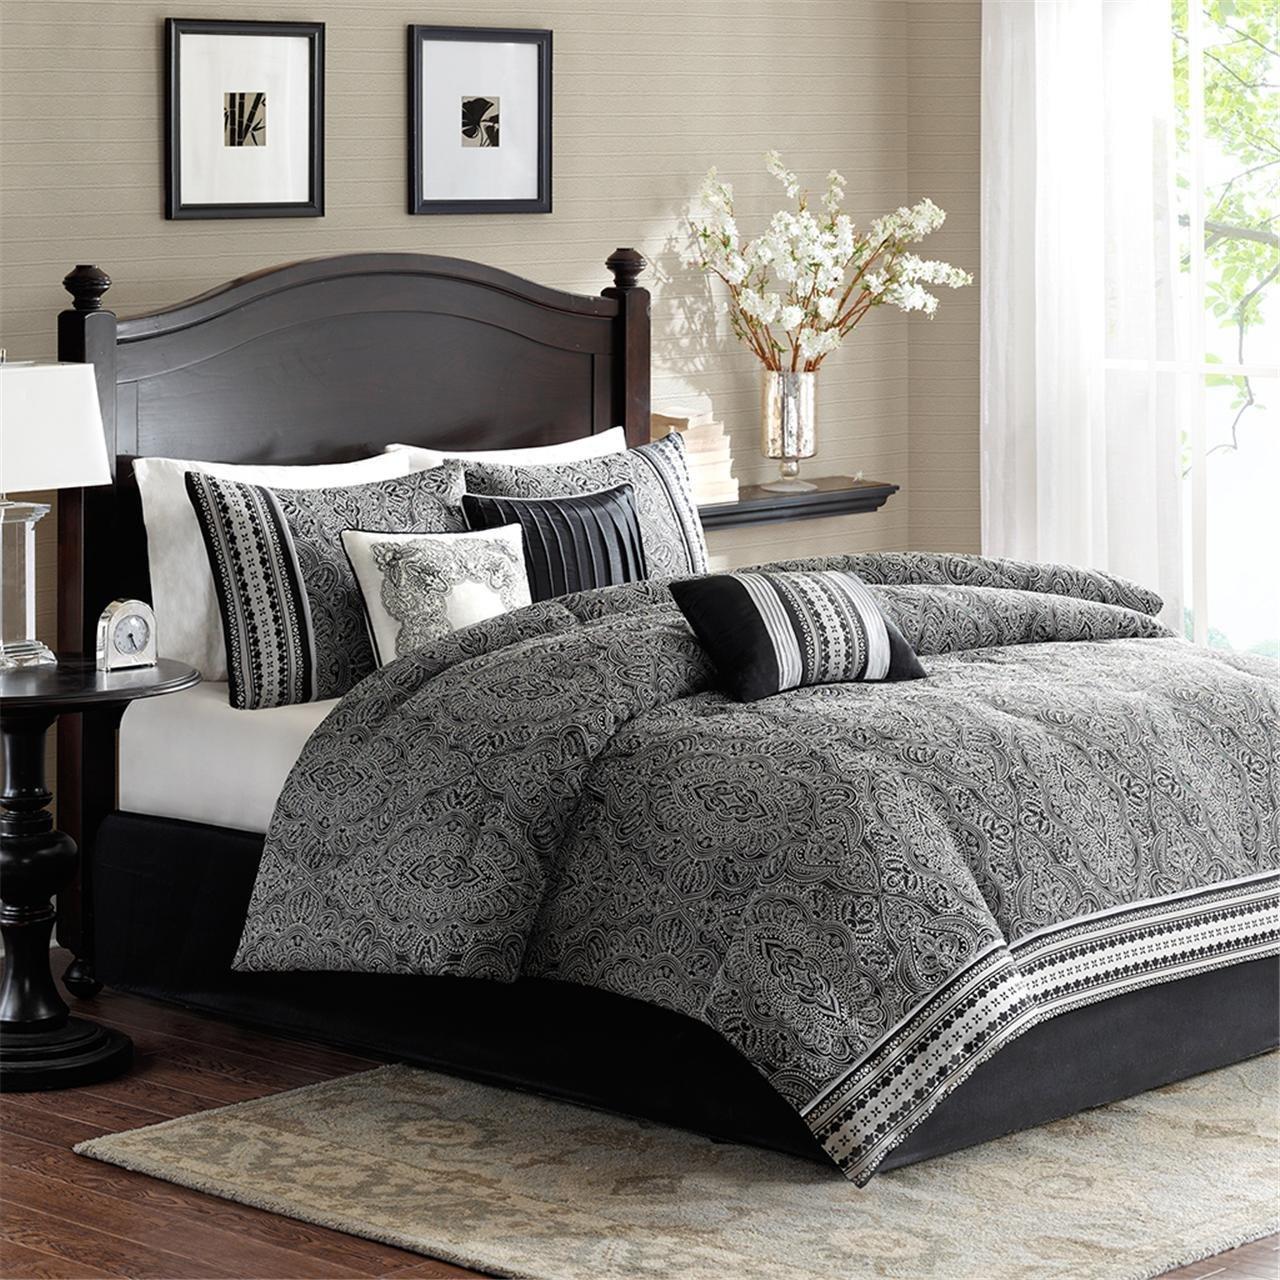 Cheap Bedroom Sets Comforters Find Bedroom Sets Comforters Deals On Line At Alibaba Com